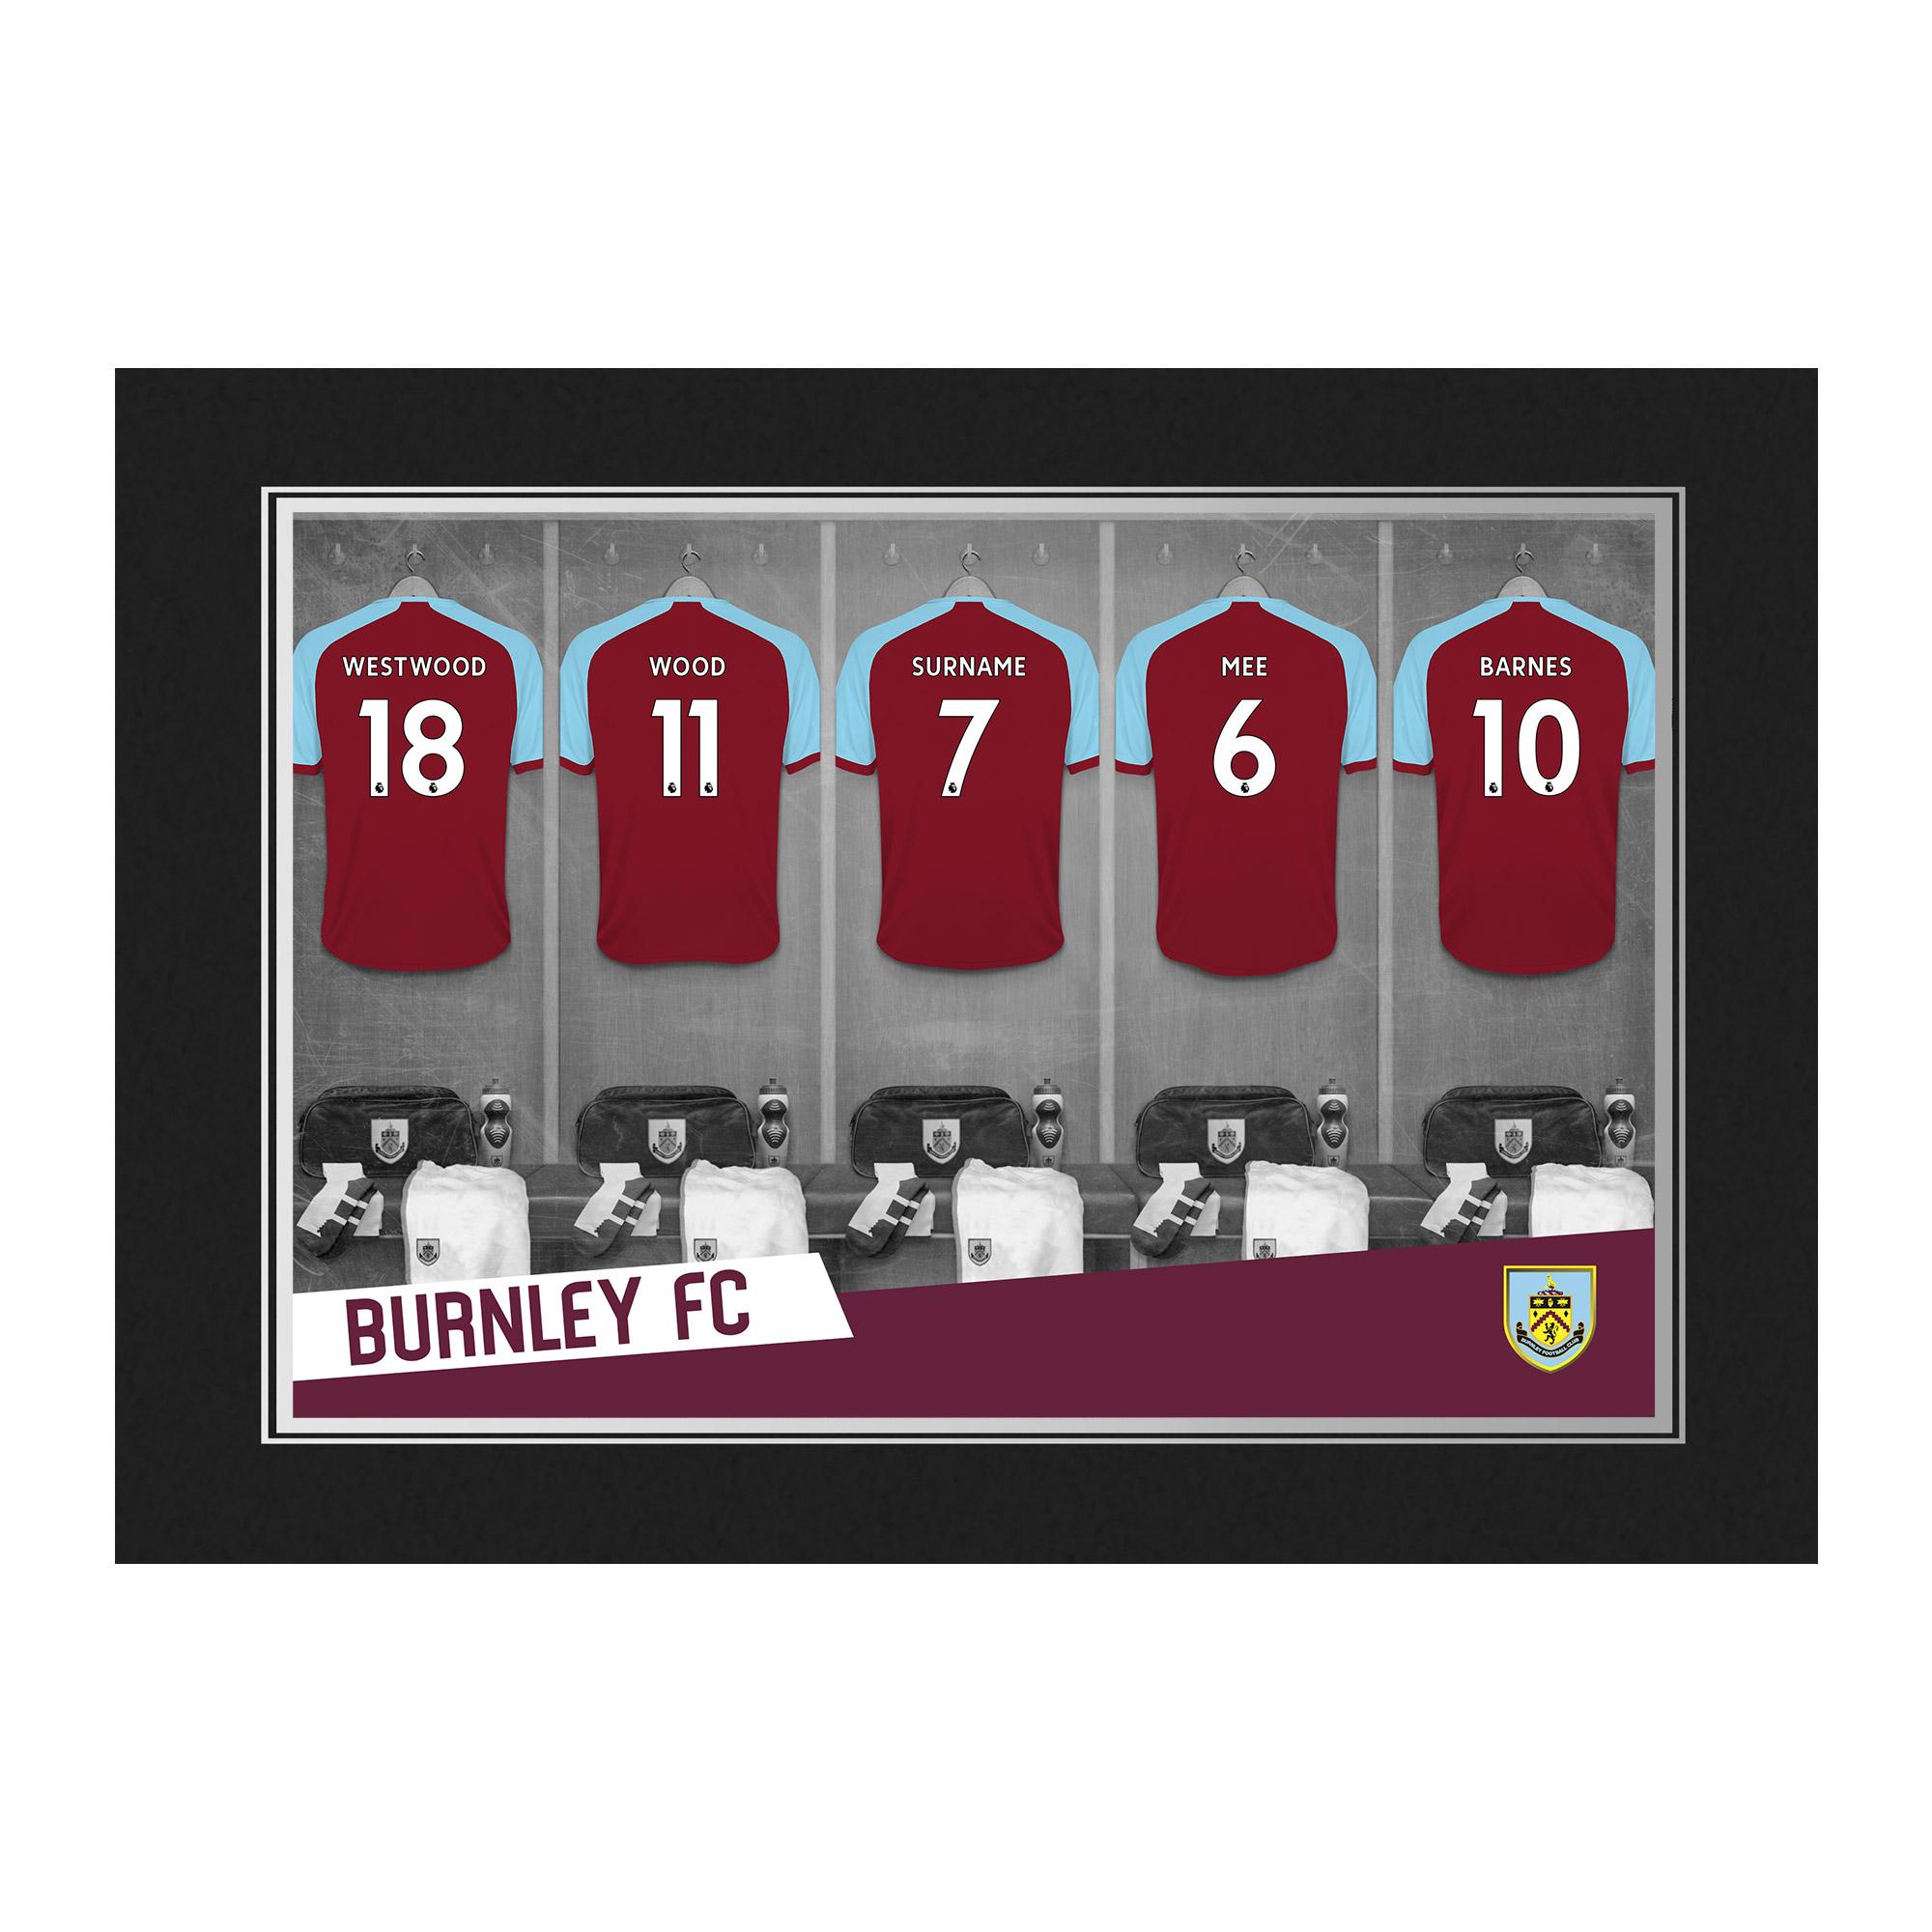 Burnley FC 9x6 Dressing Room Photo